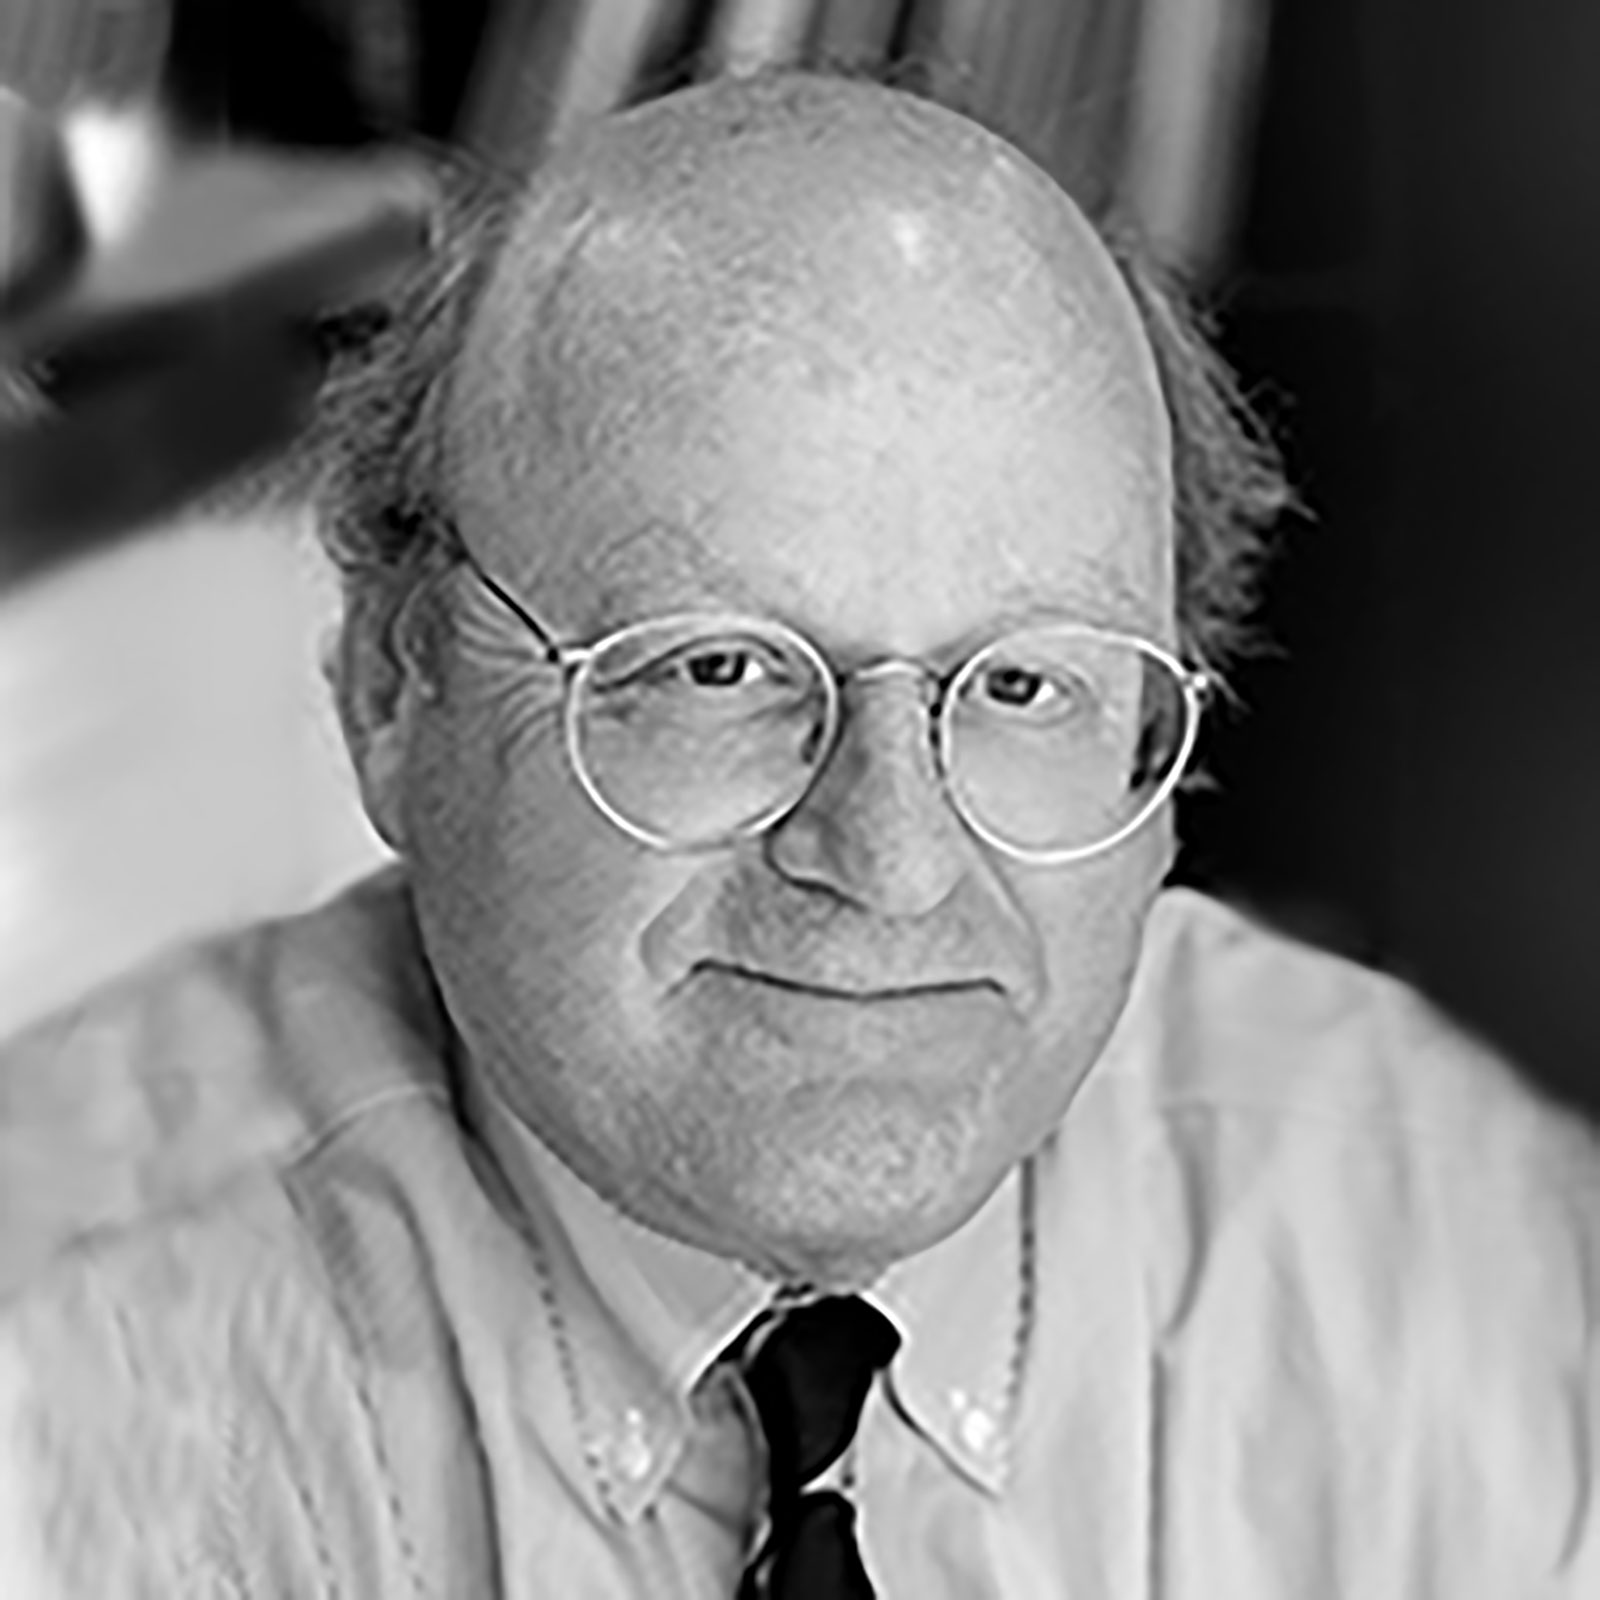 Thomas H. Beeby